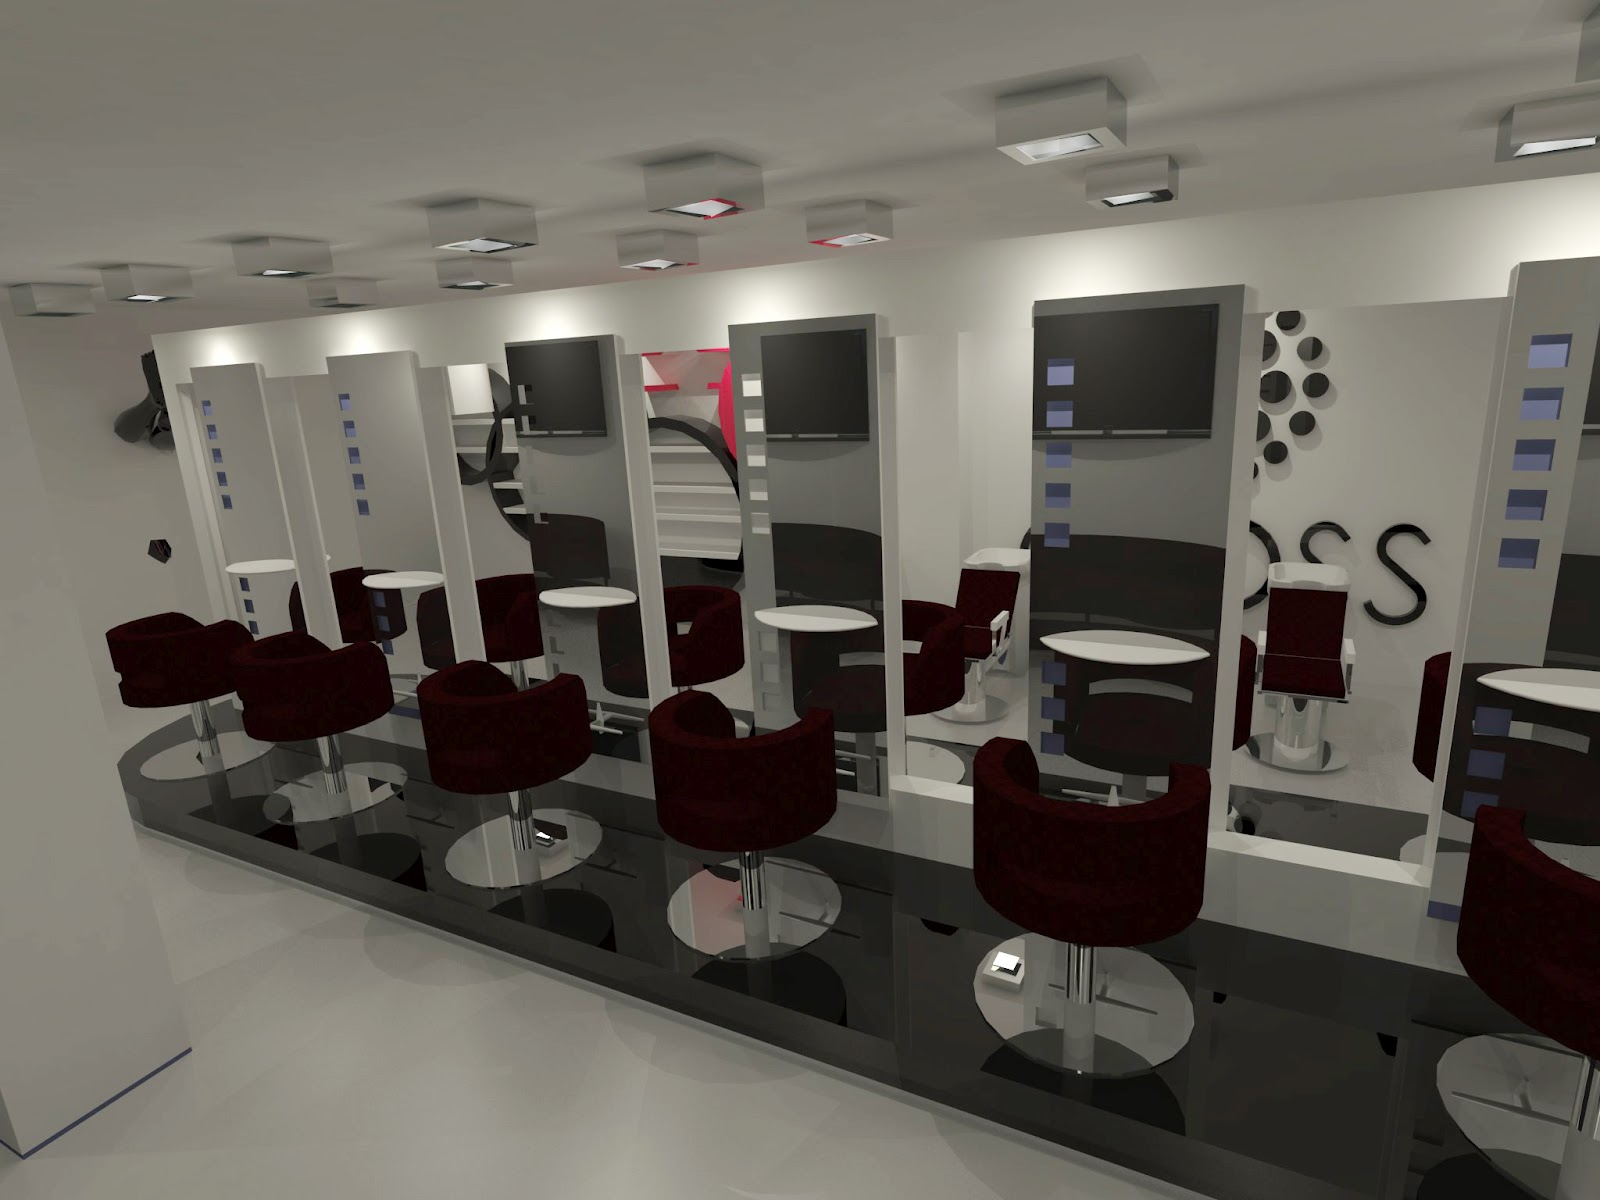 Dise o de interiores escuela de arte de motril sal n de for Spa y salon de belleza